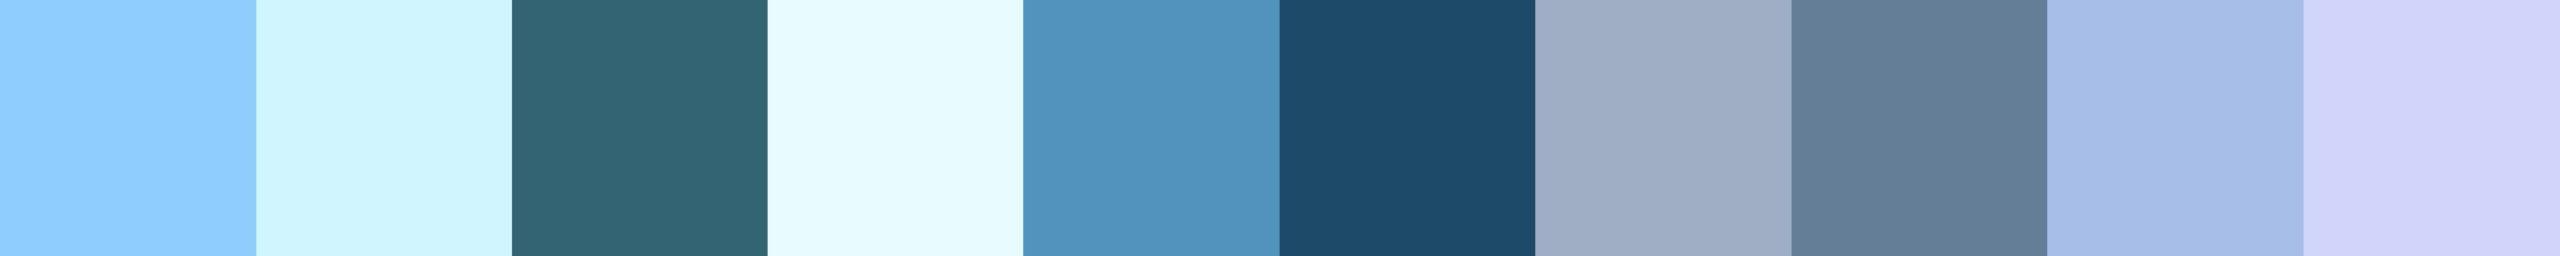 636 Lestra Color Palette